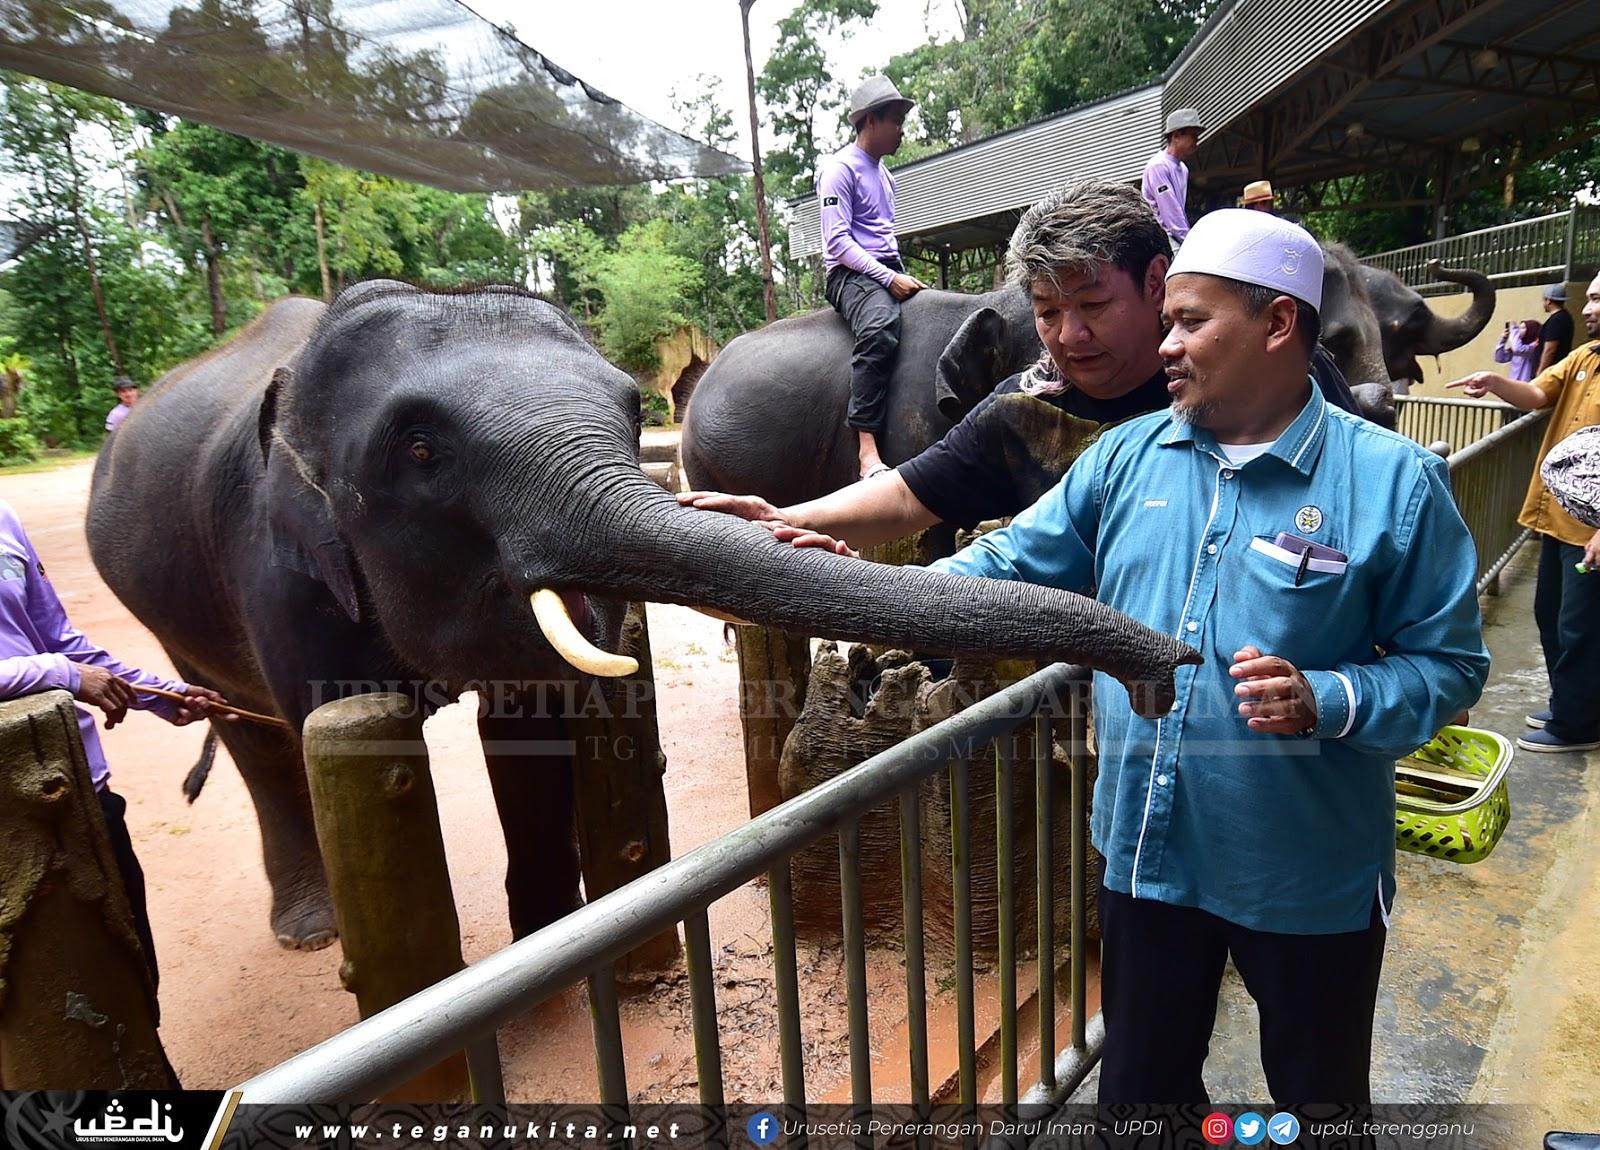 Diskaun Harga Tiket Perkampungan Konservasi Gajah Kenyir Jun Ini